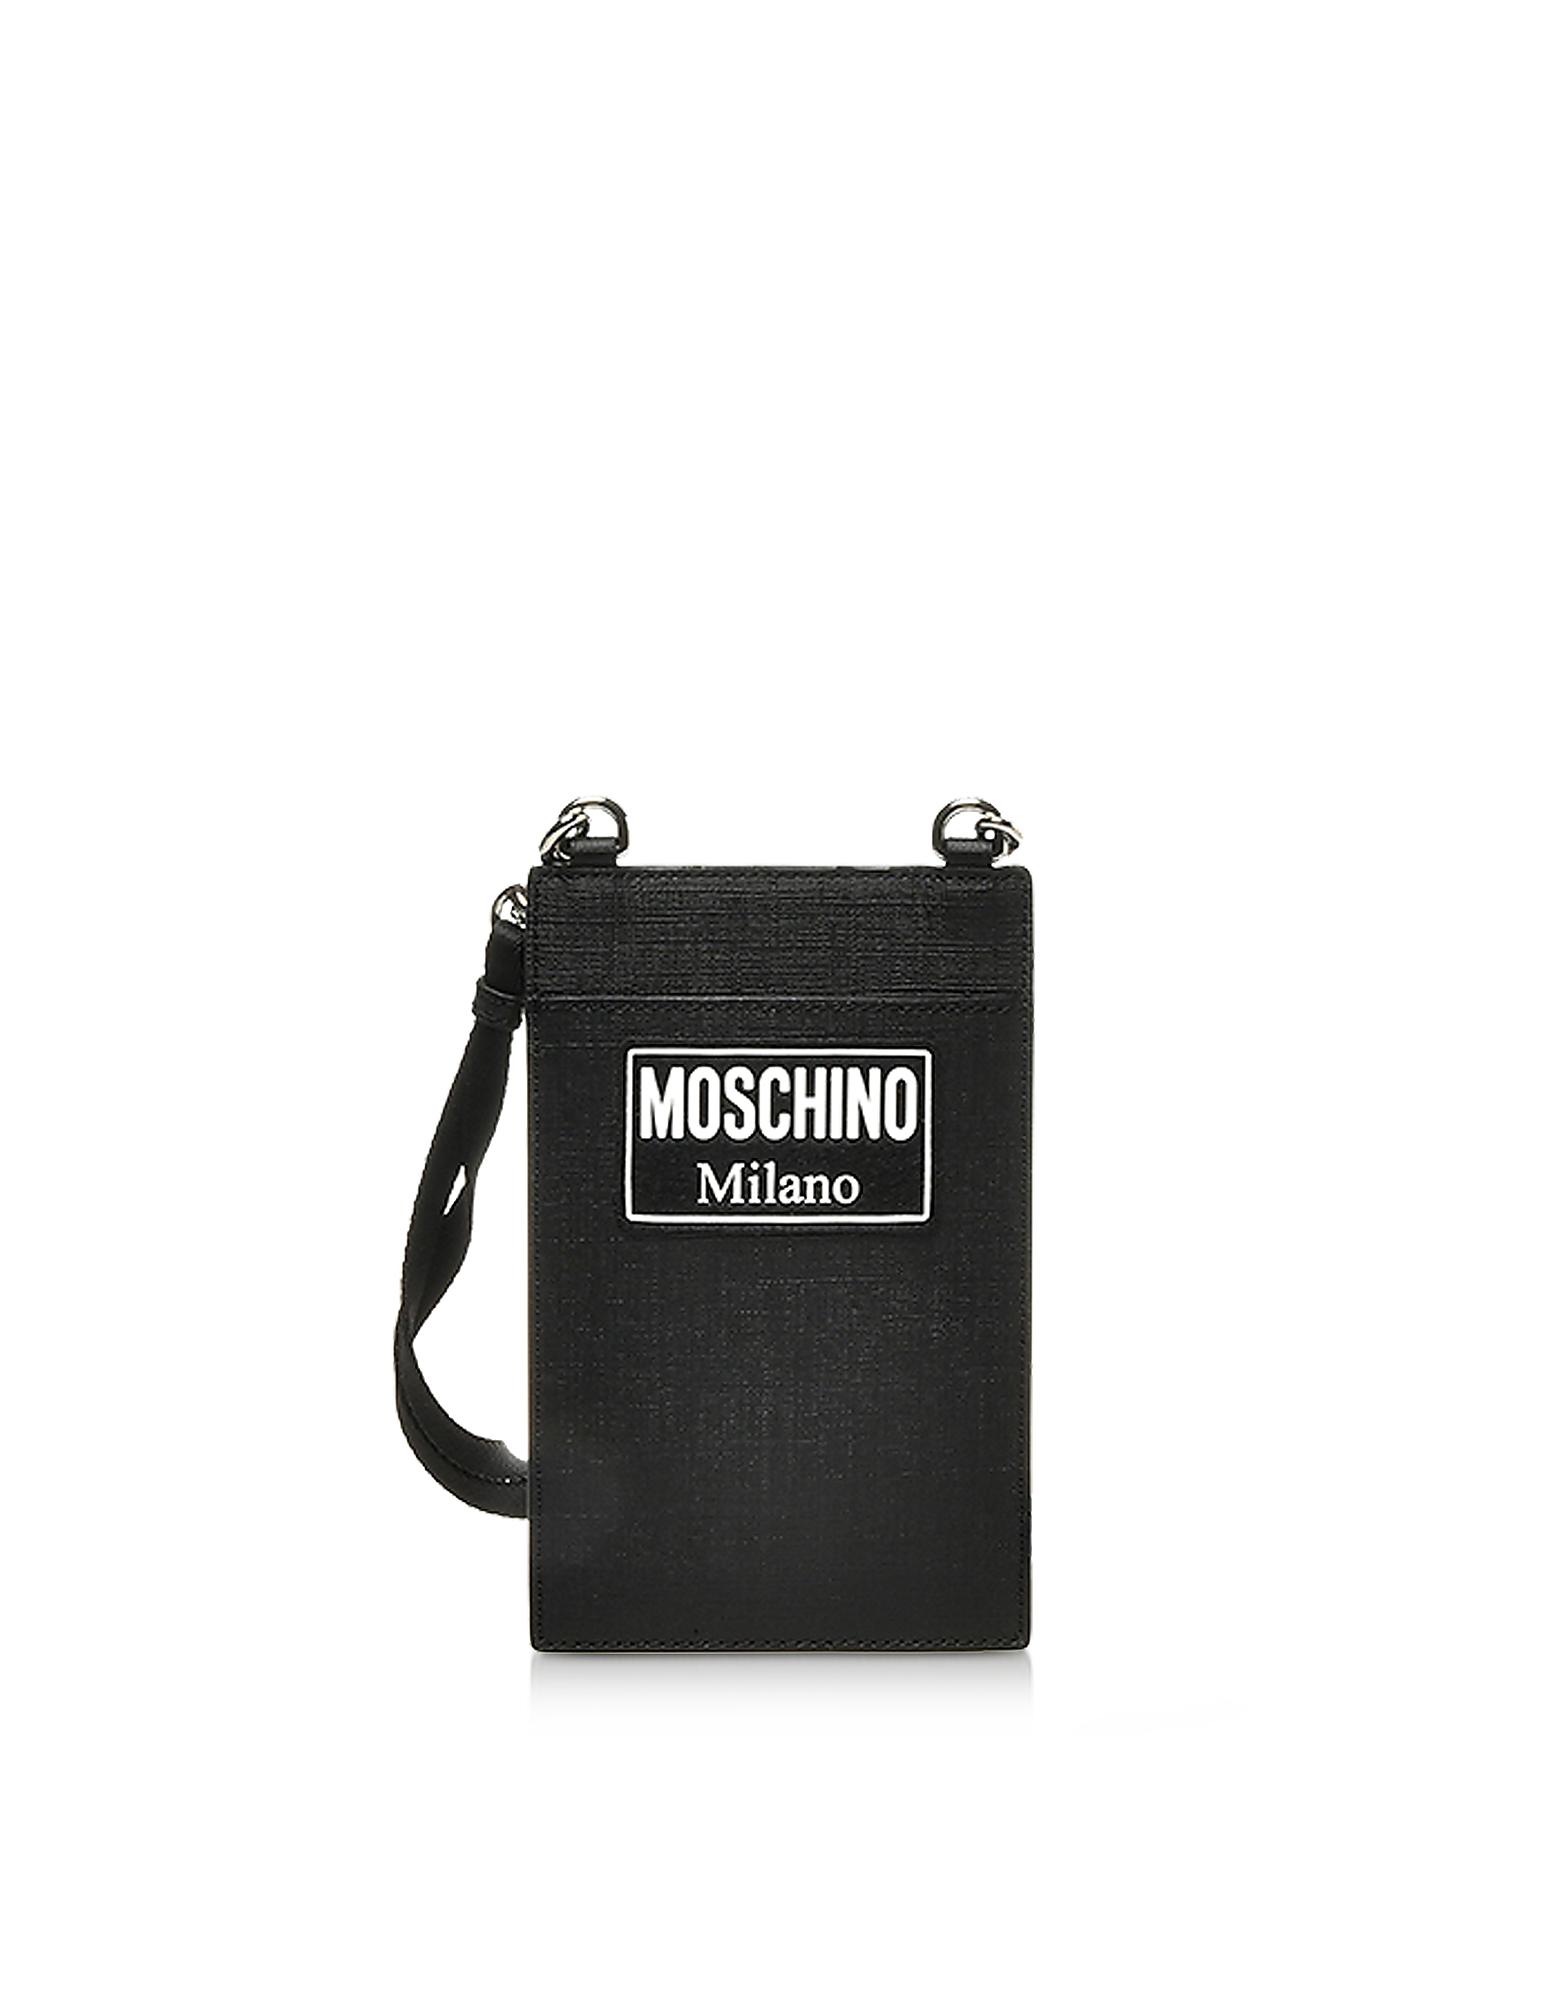 Moschino Accessories BLACK SIGNATURE CARD HOLDER W/STRAP